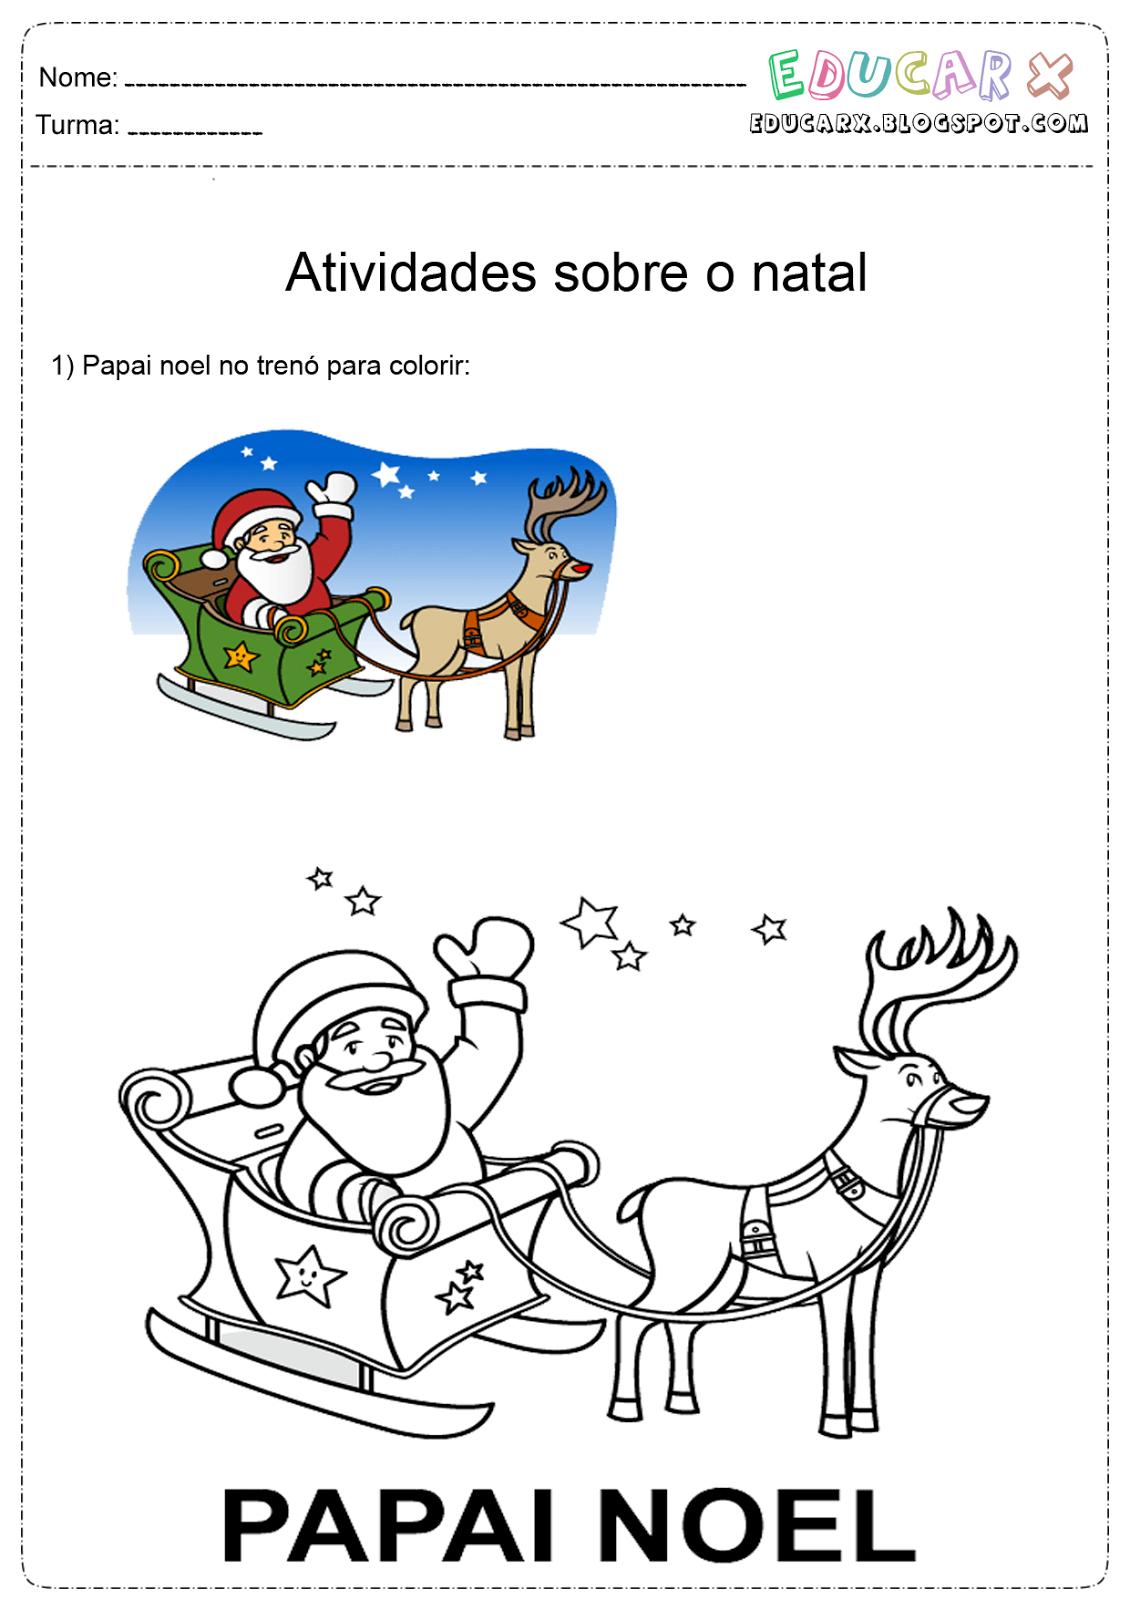 Desenho para pintar de Papai Noel voando em seu trenó - imagens de papai noel no trenó para colorir